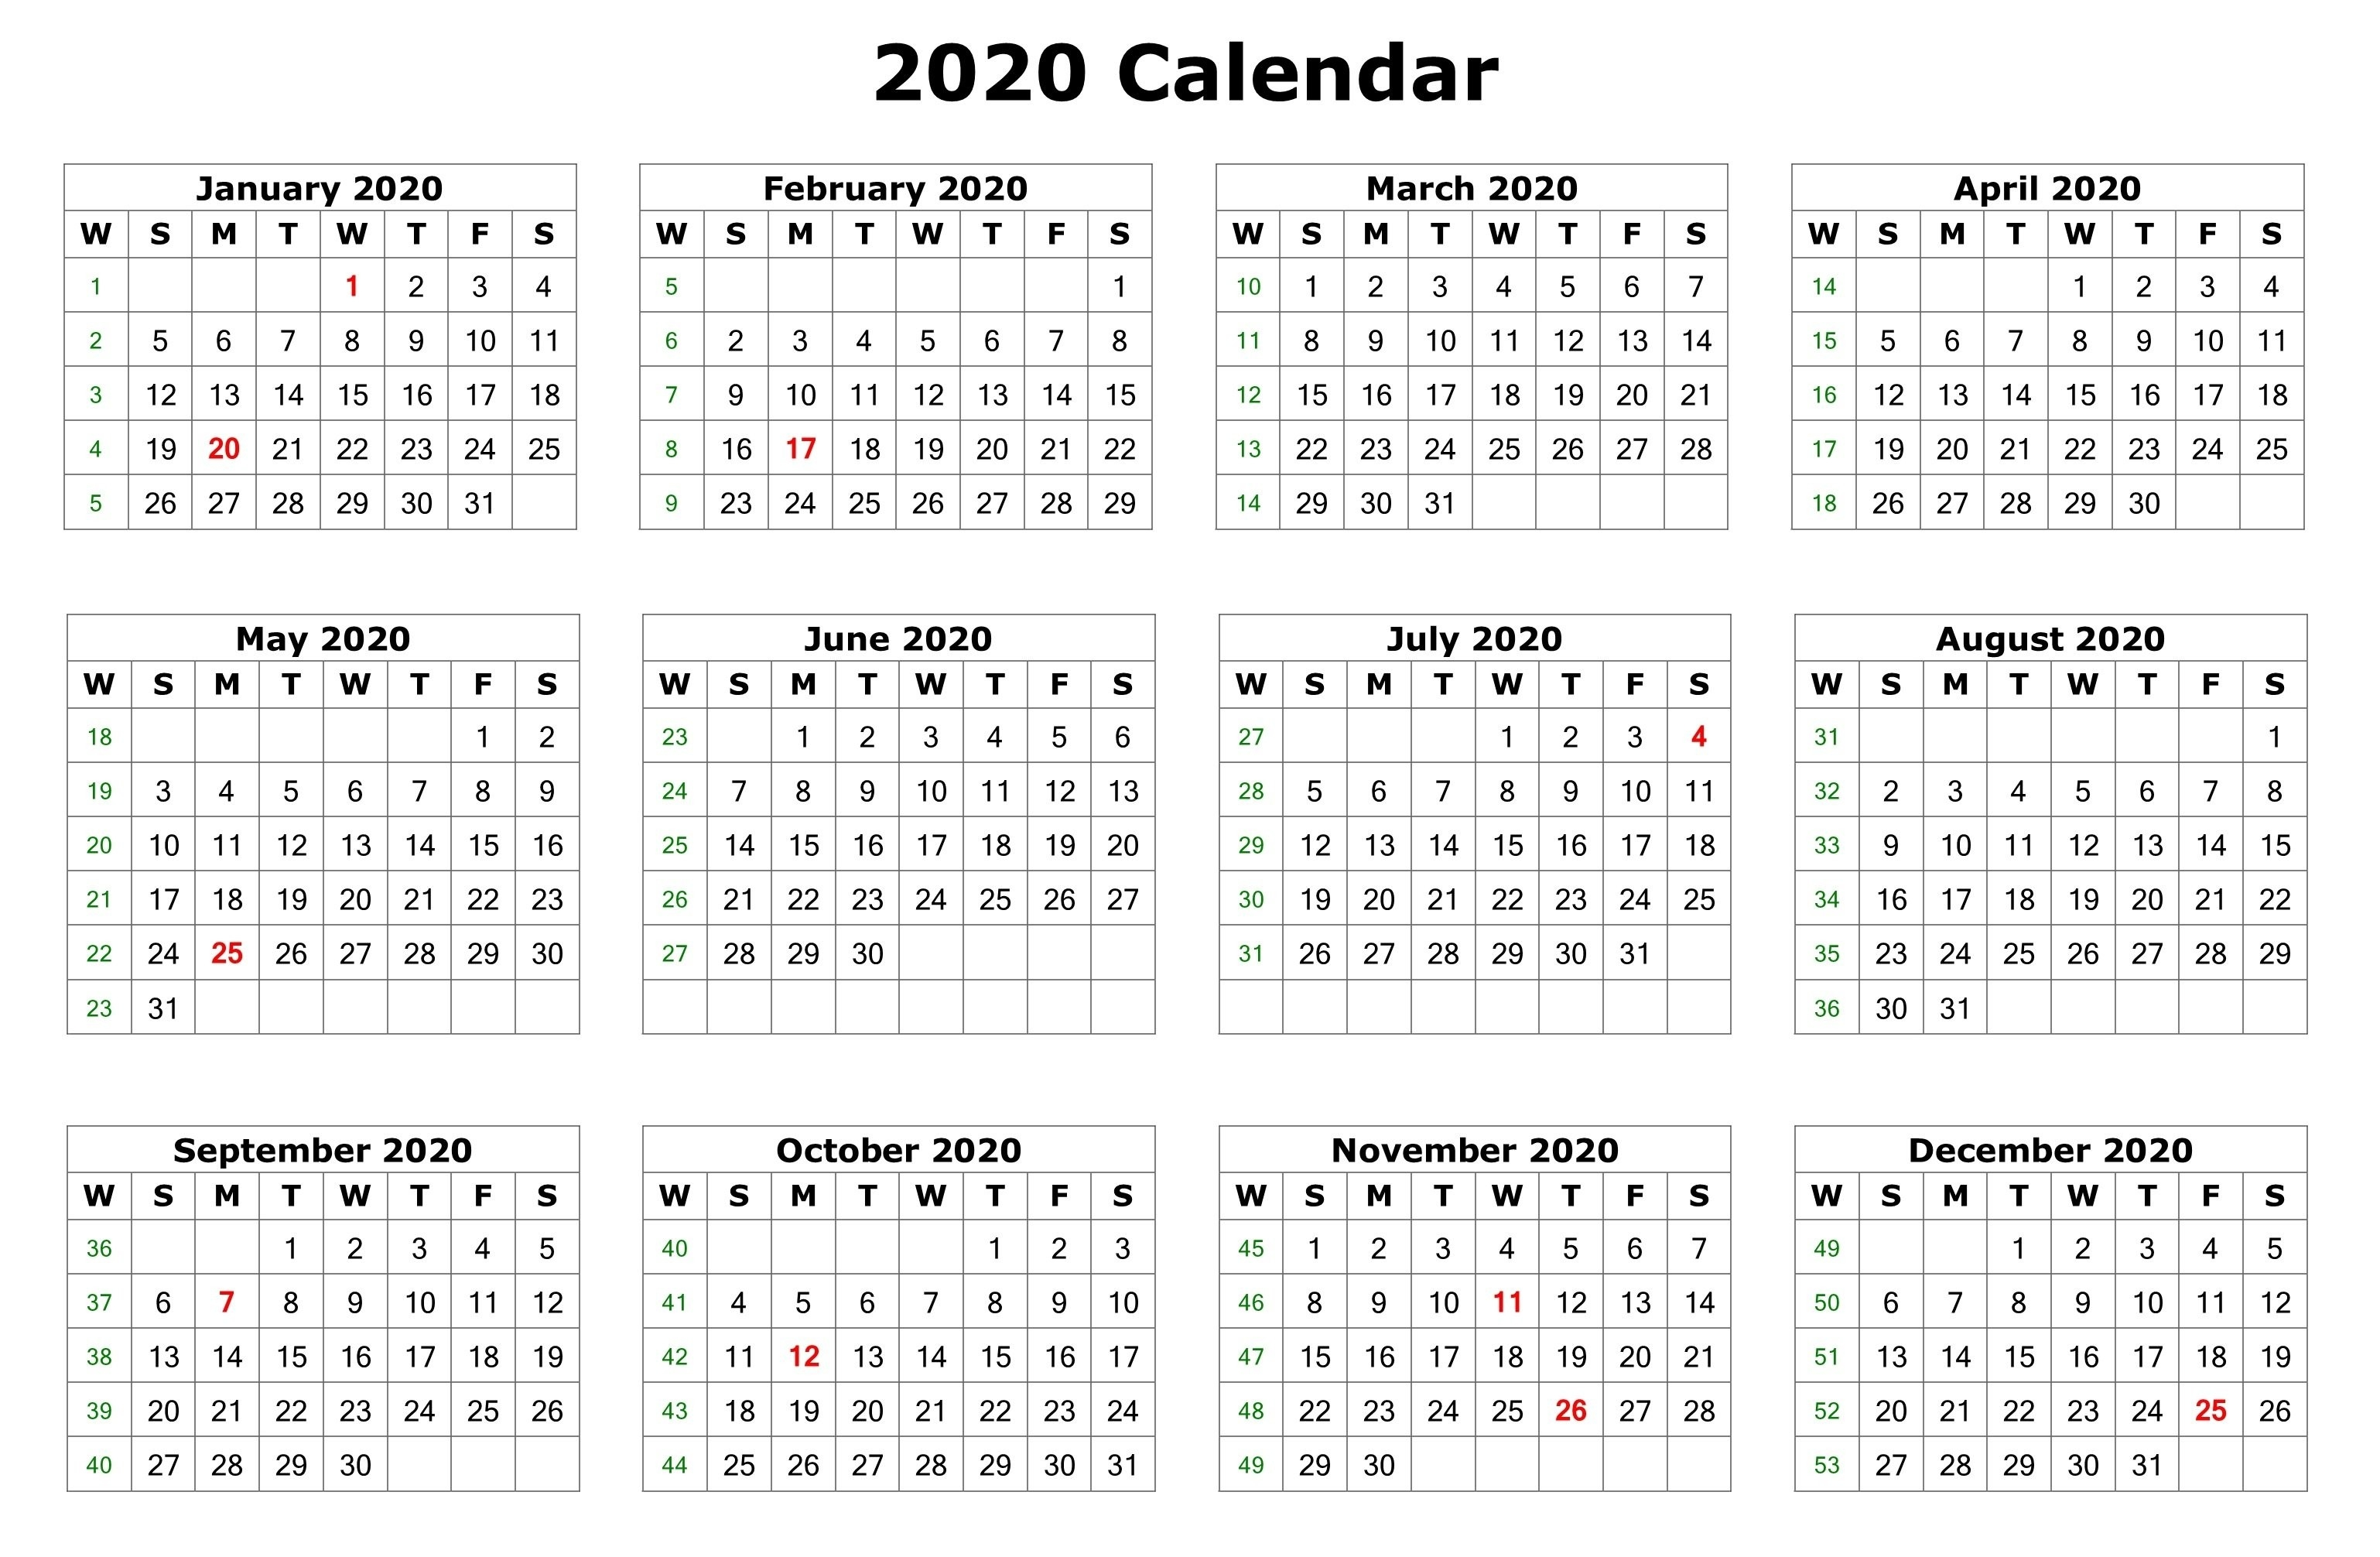 2020 One Page Calendar Printable | Calendar 2020  Calendar 2020 Printable One Page